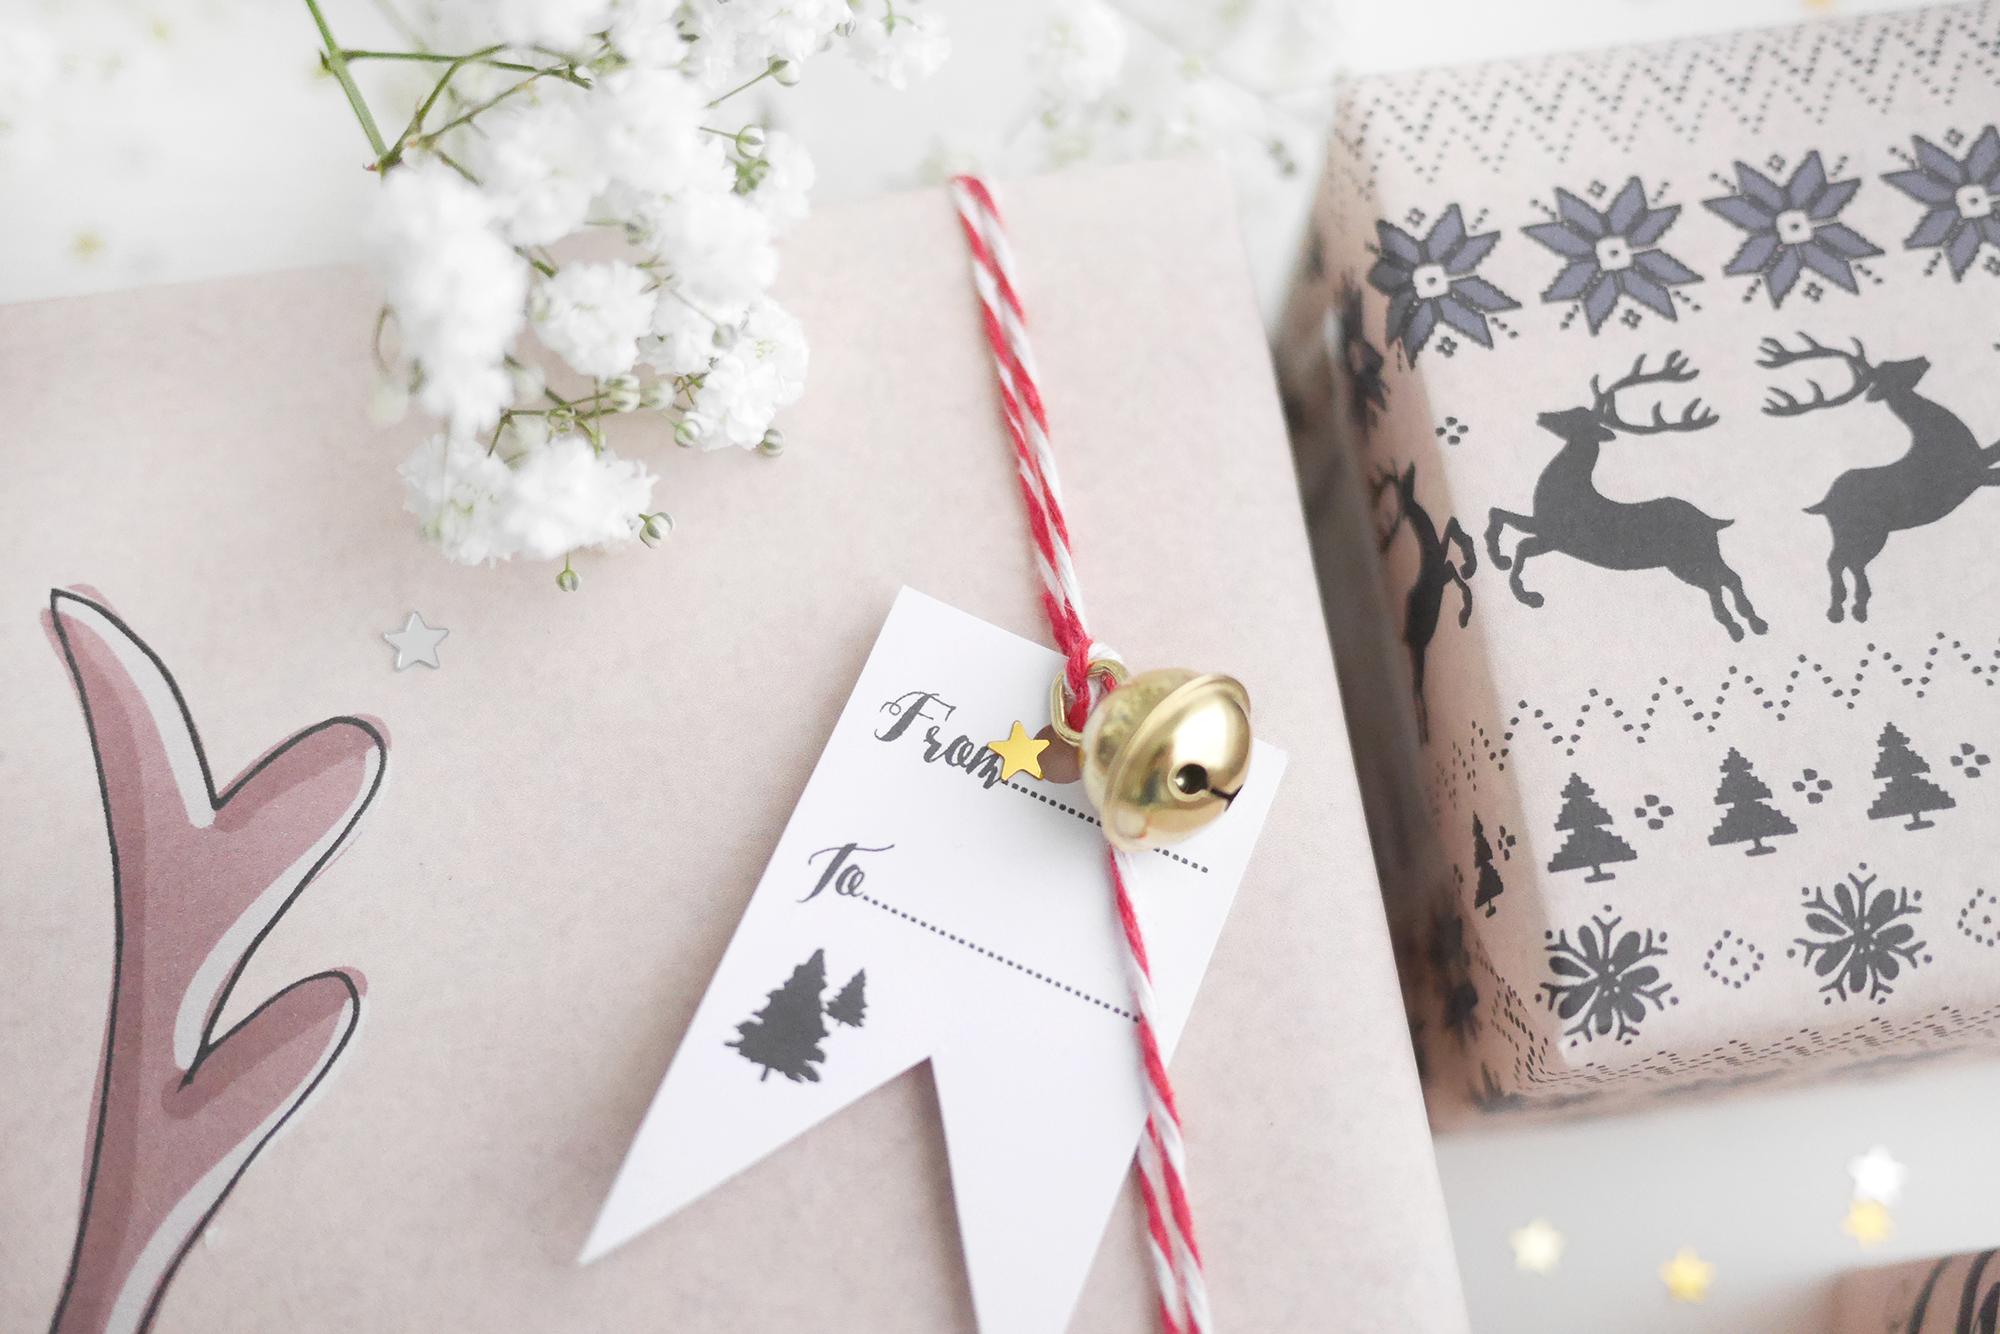 Kerstmis 2016 cadeauverpakking en labels 1